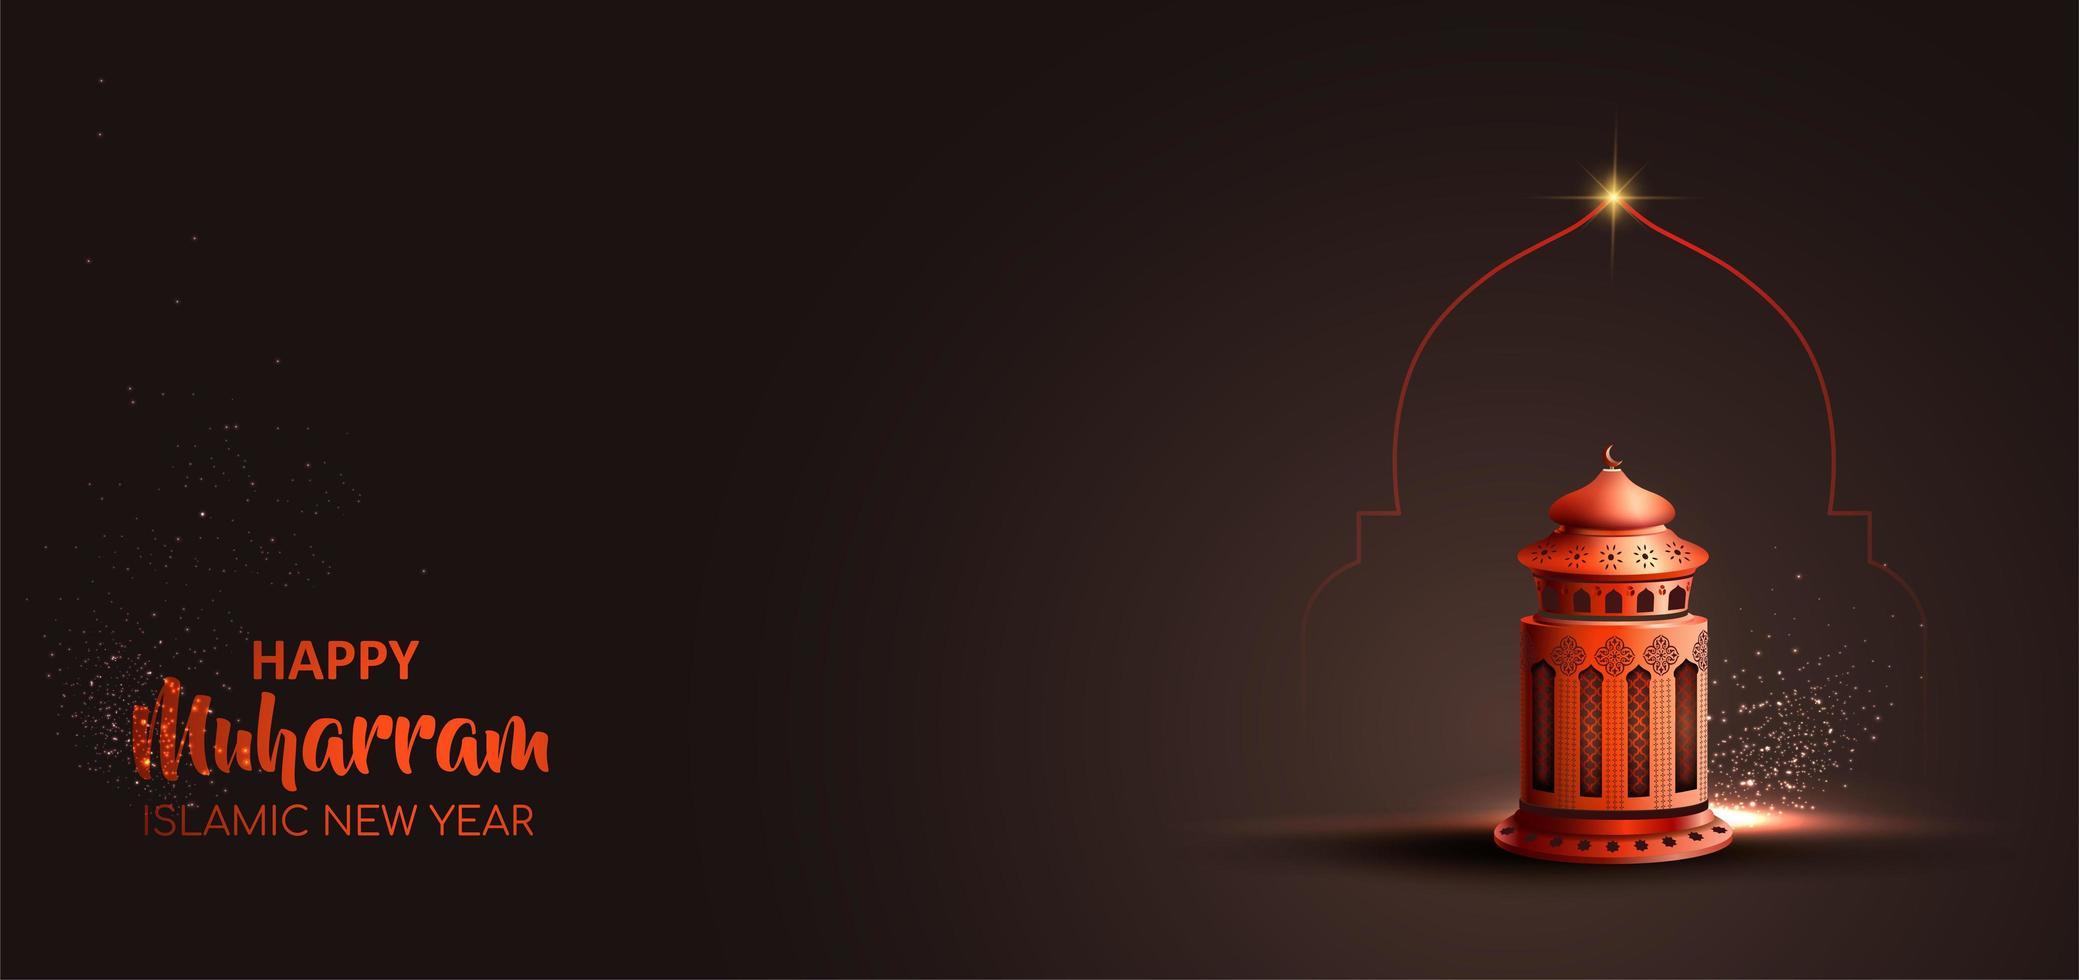 Happy muharram islamic new year card design with red lantern  vector